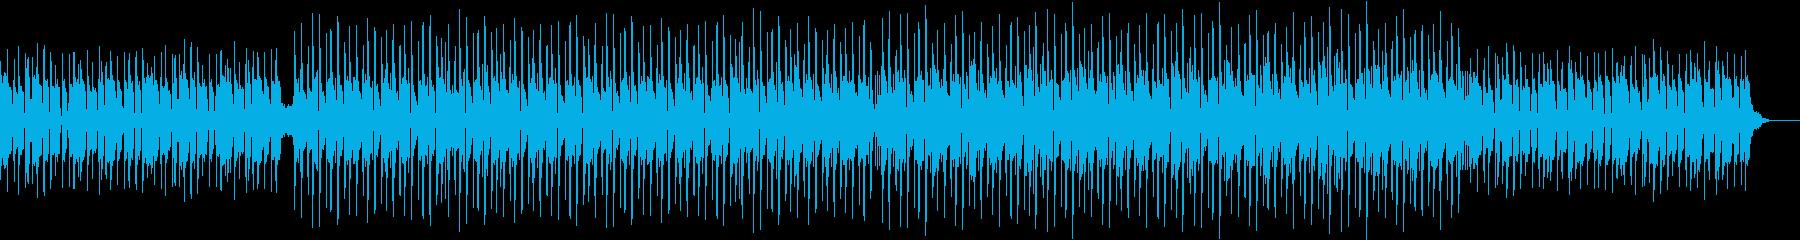 TikTokの某曲っぽいトロピカルハウスの再生済みの波形